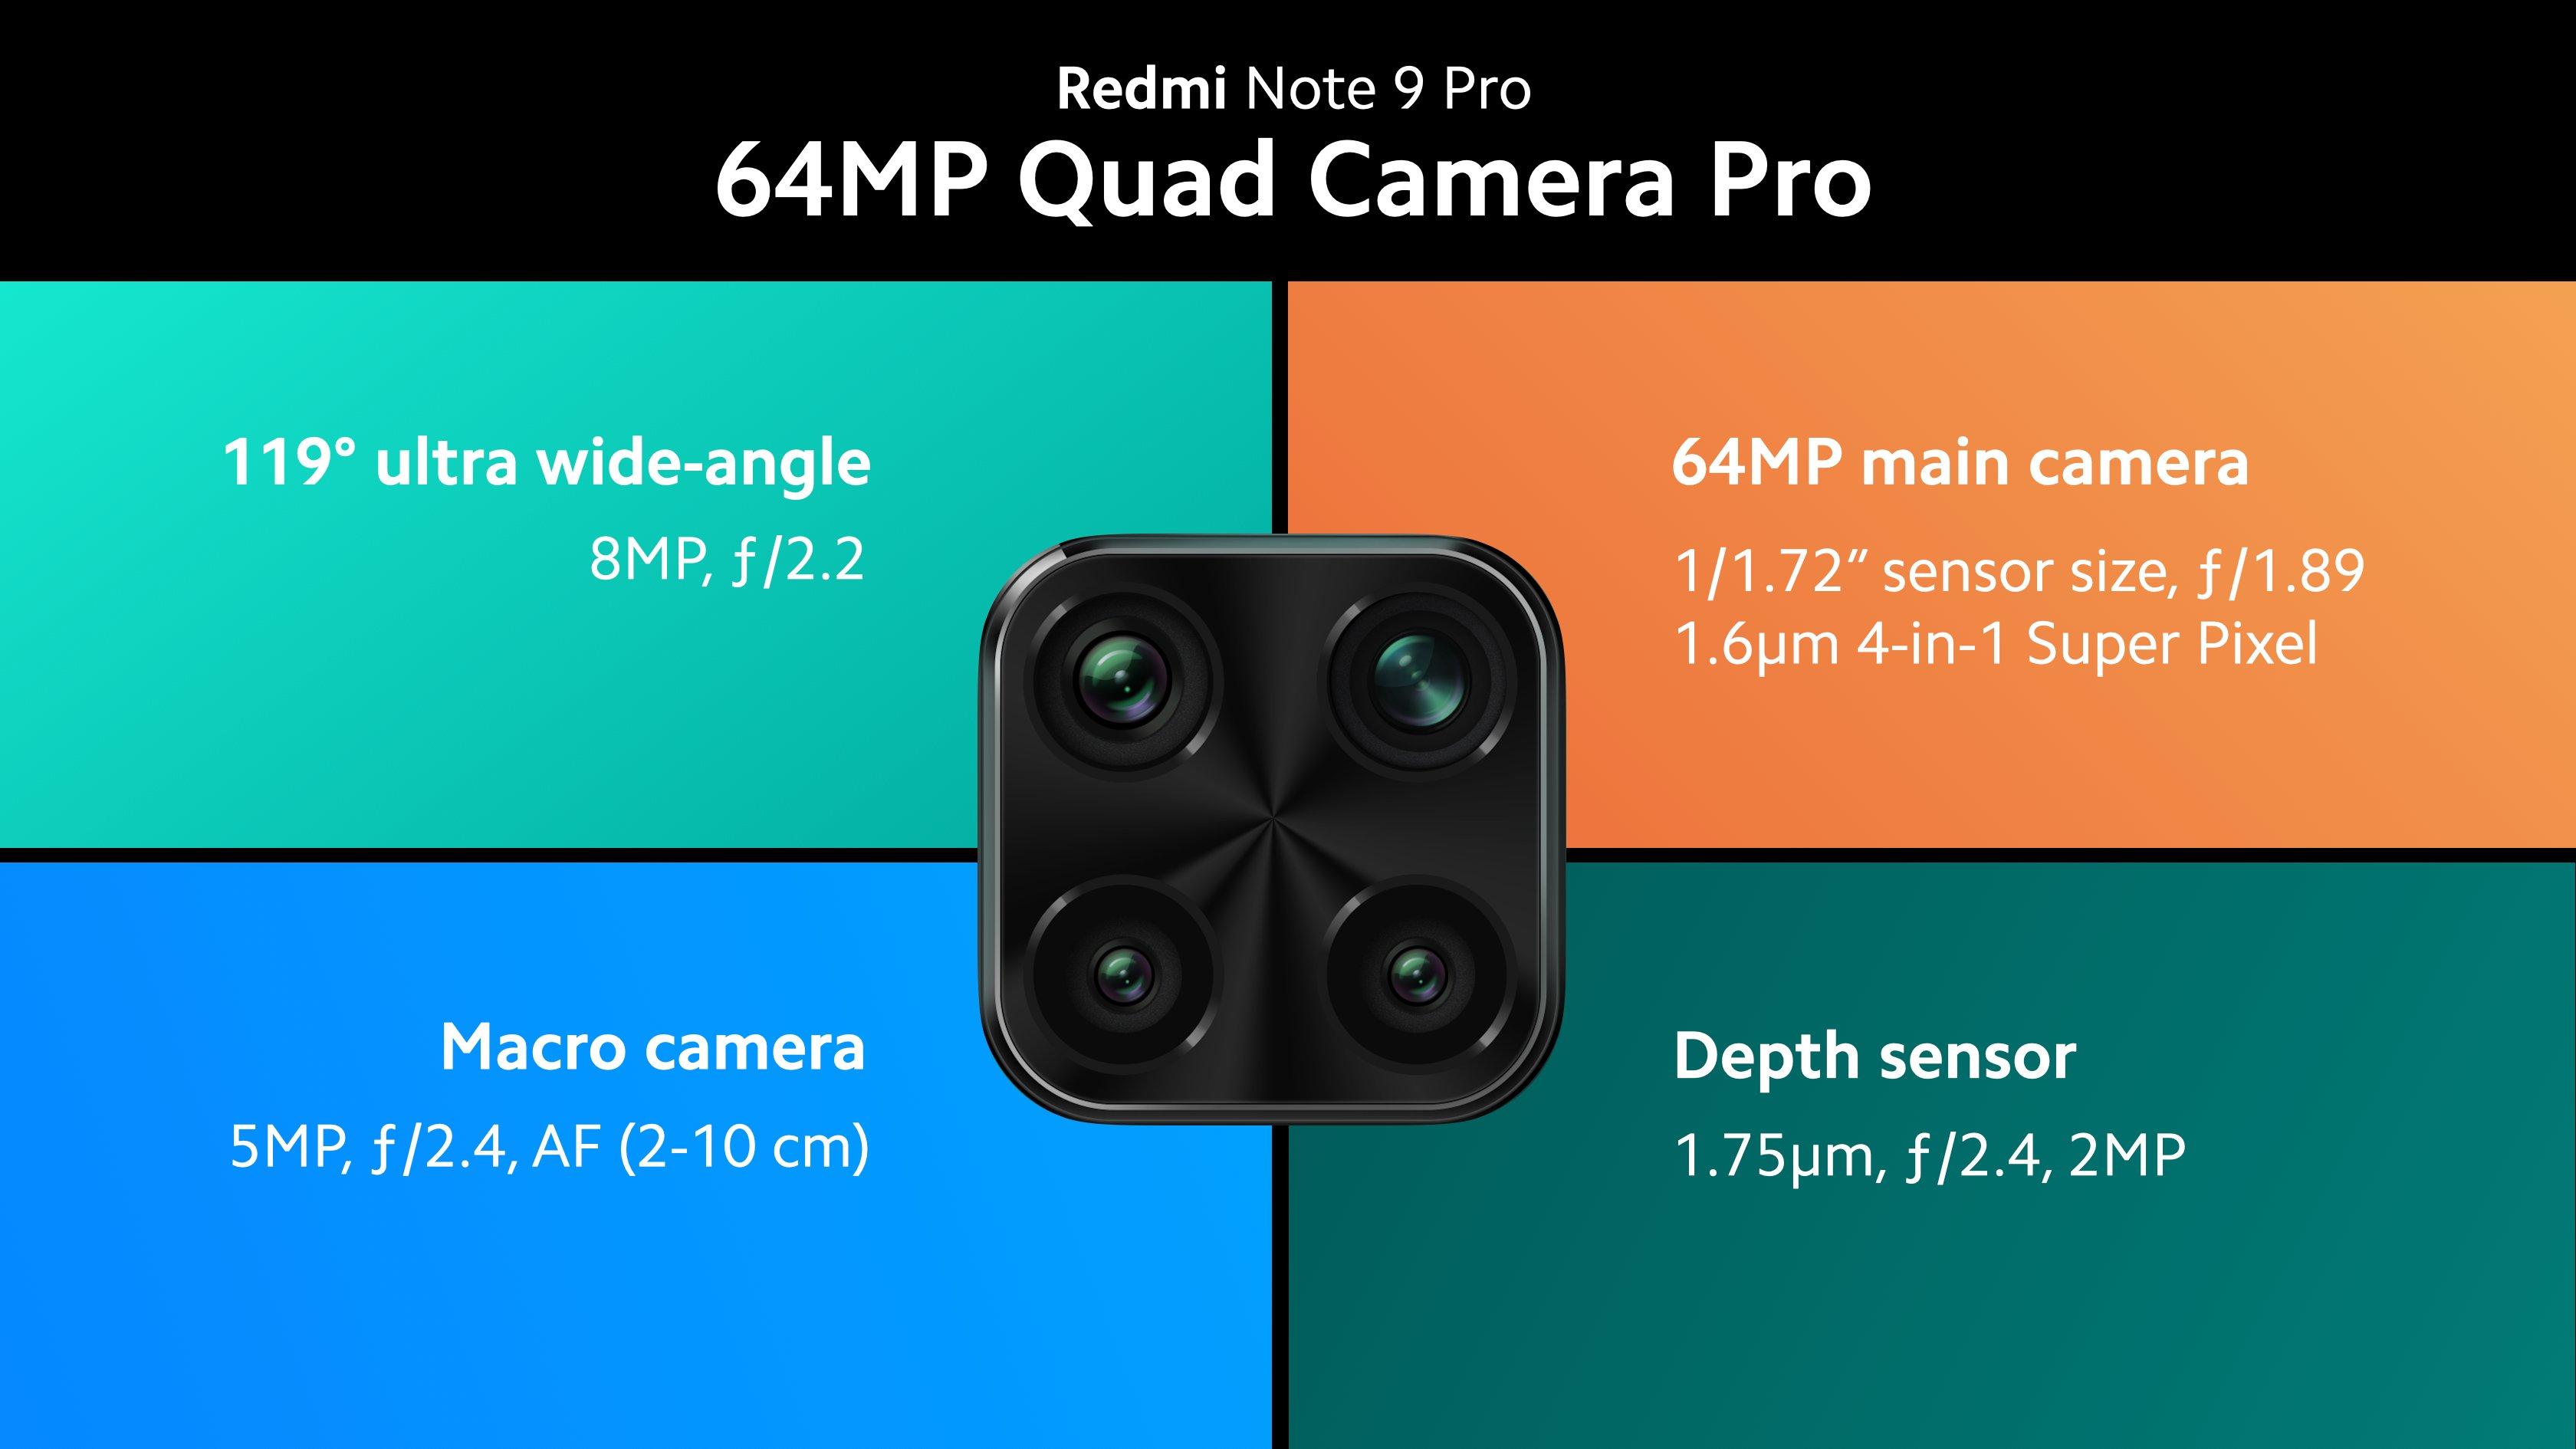 64MP Quad Camera Pro Setup of Redmi Note 9 Pro